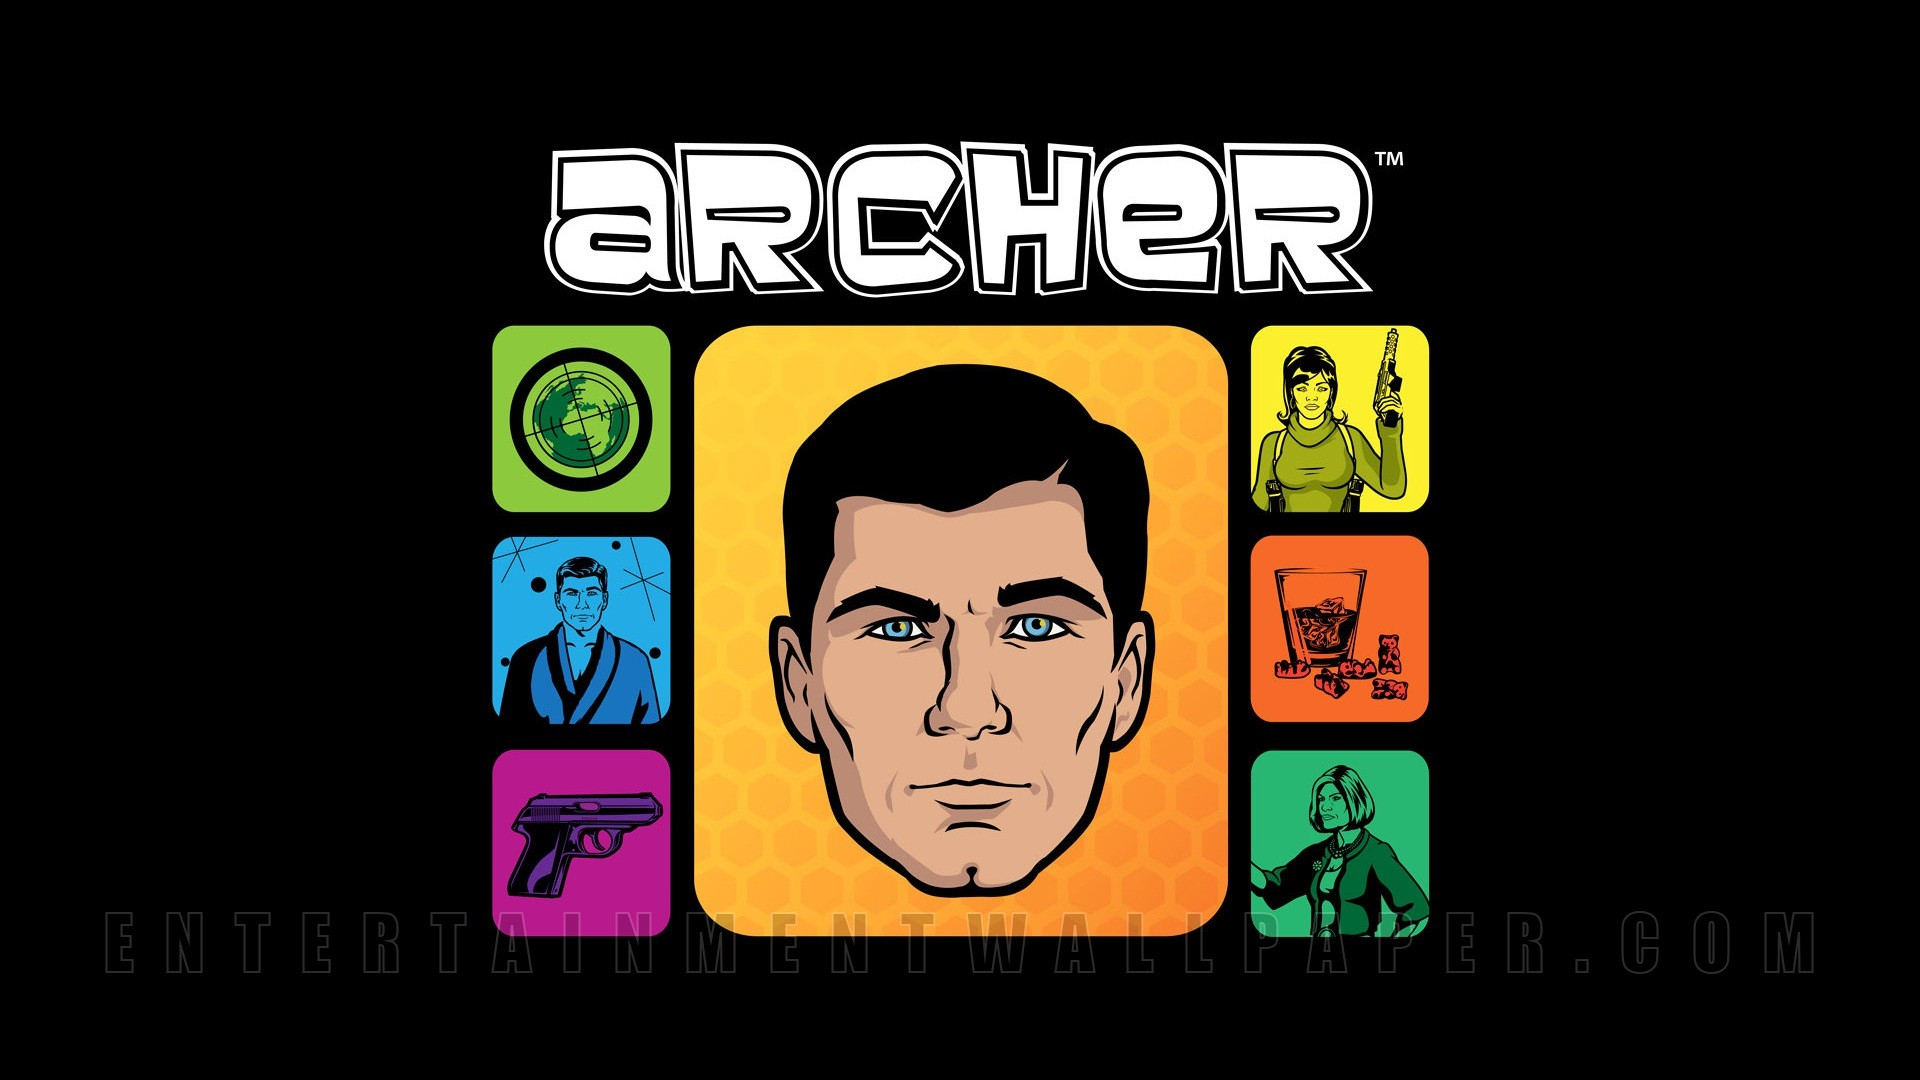 Archer wallpaper ·① Download free amazing full HD ...